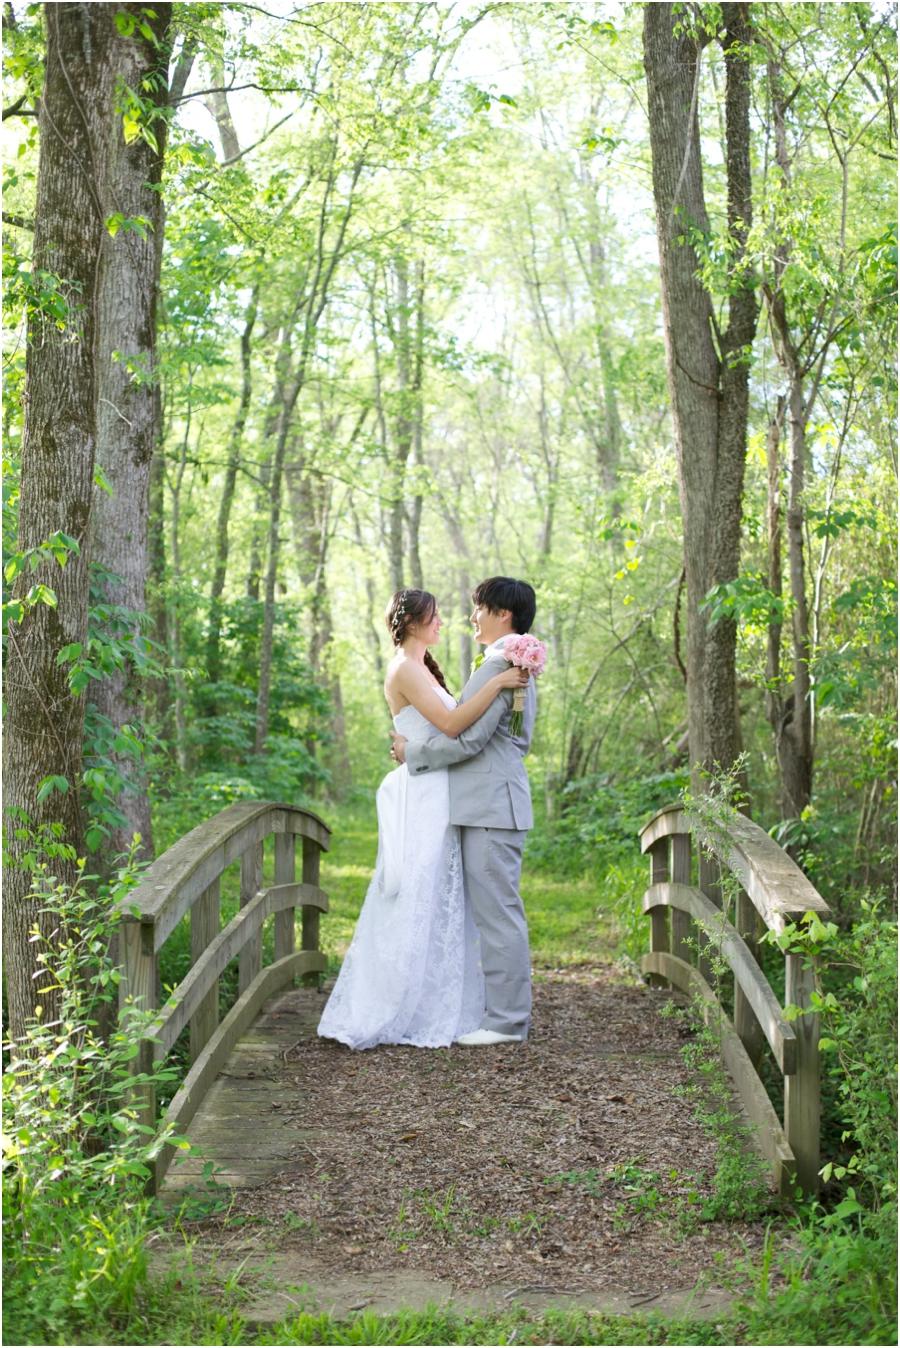 romantic forest wedding portraits, rustic wedding photography